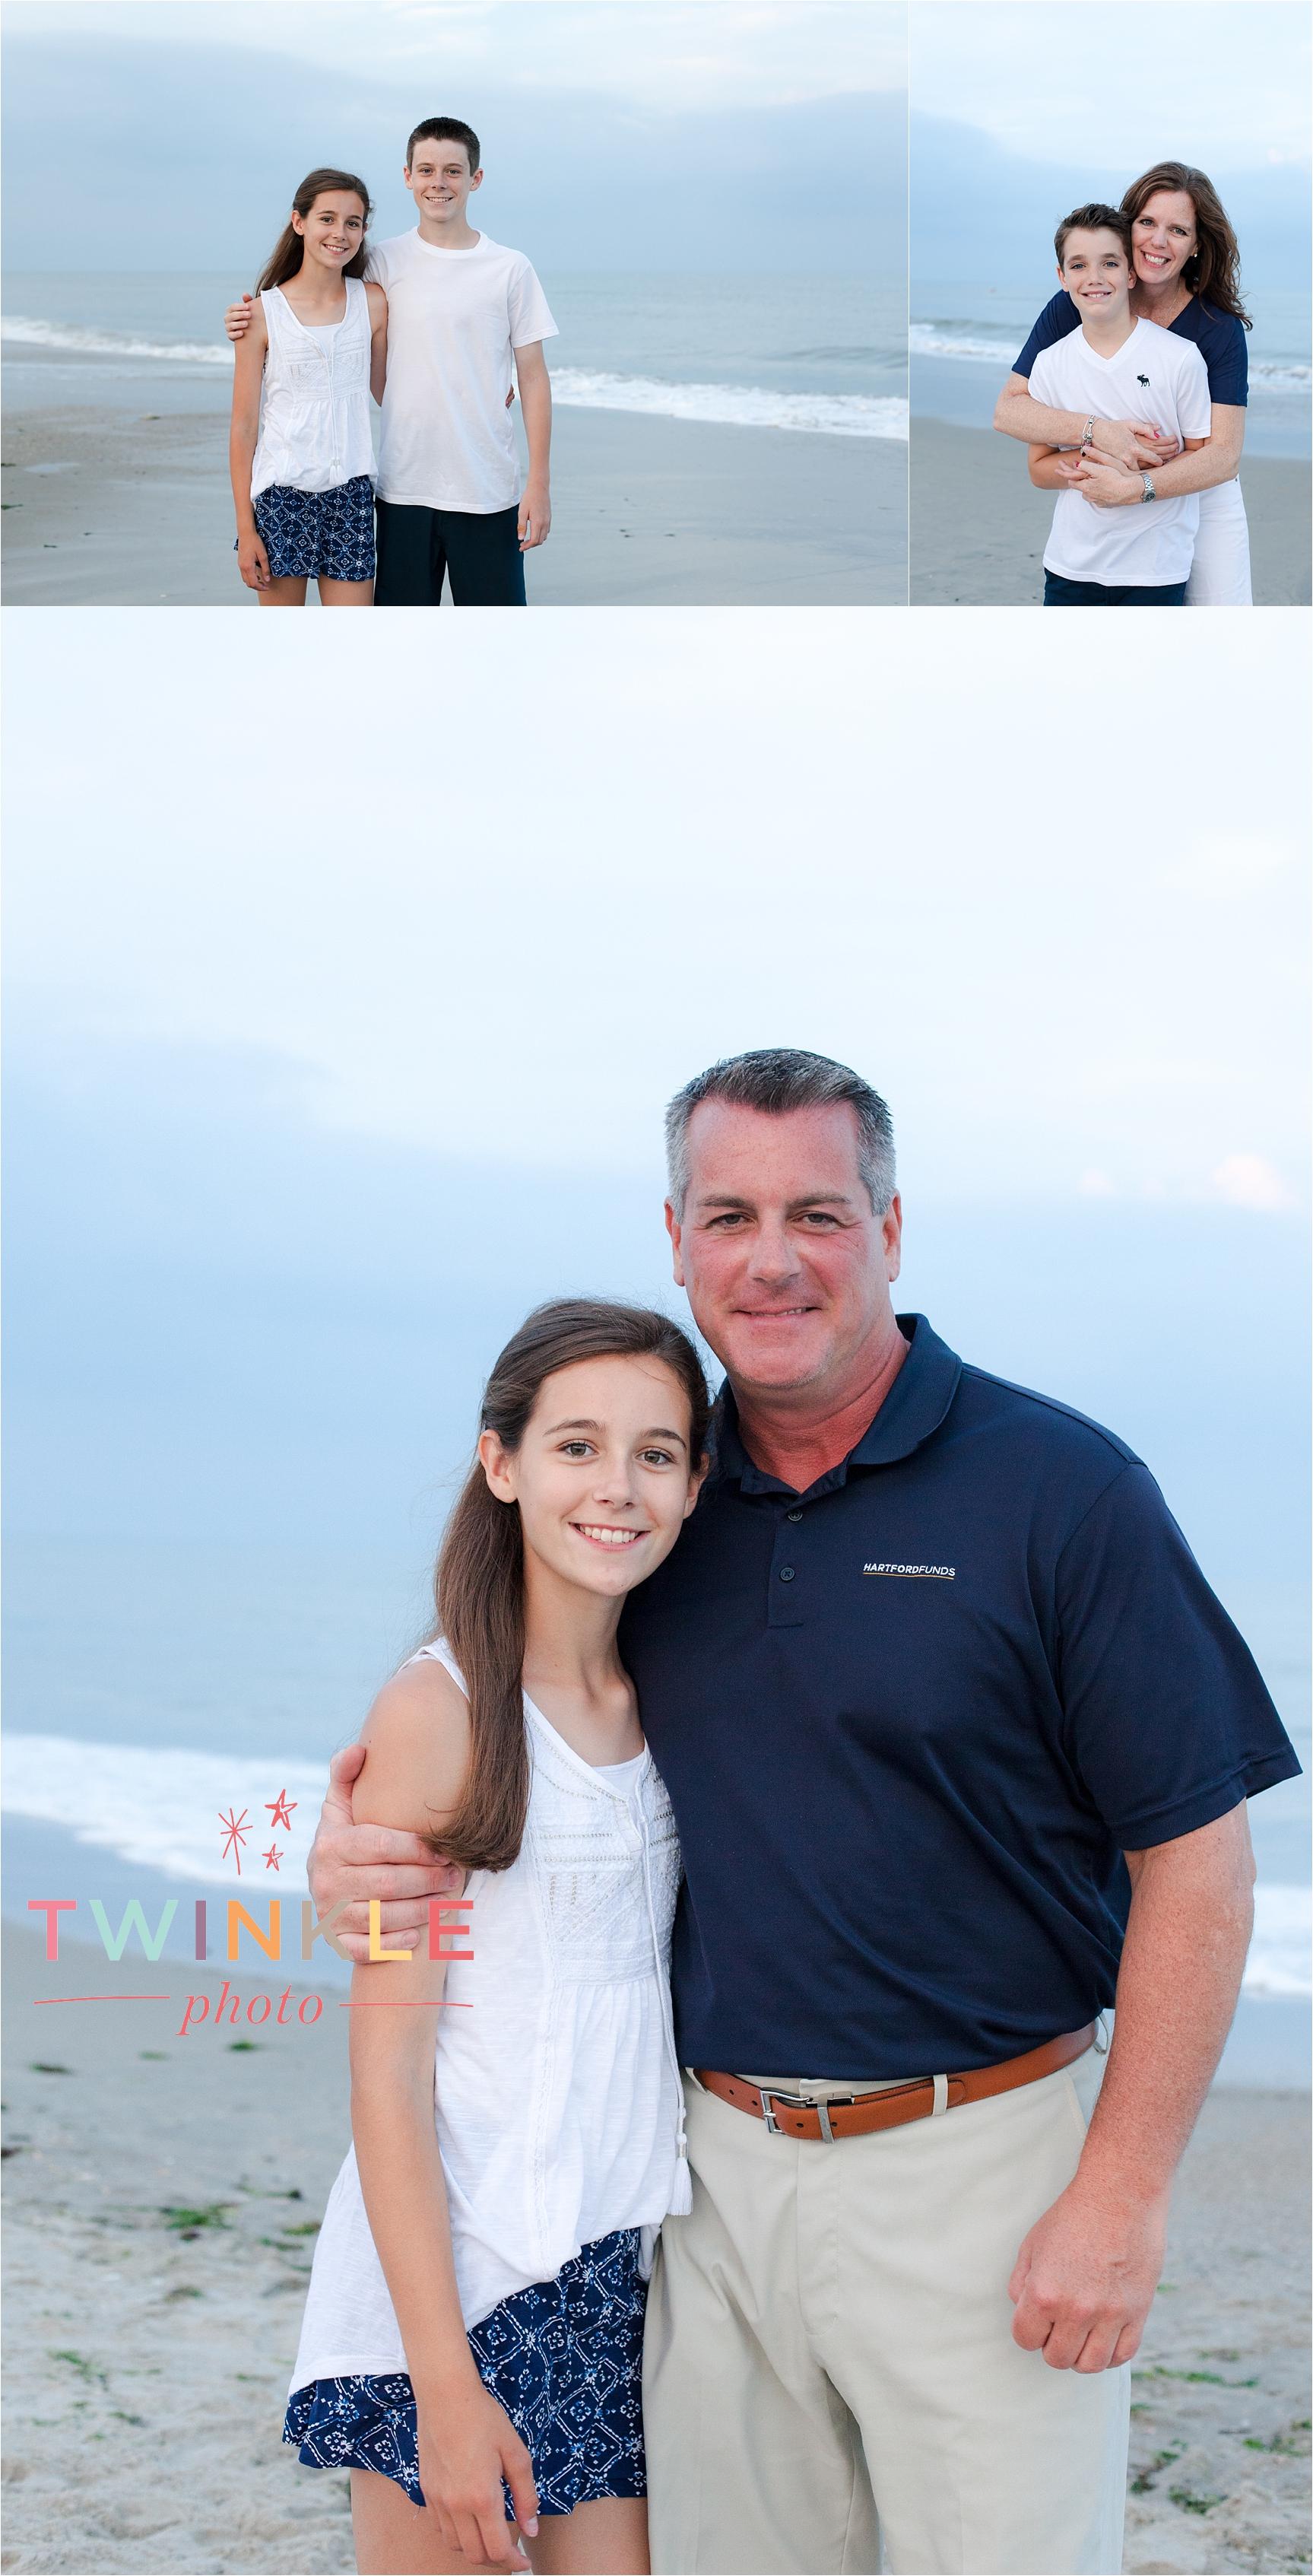 OCNJ Ocean City New Jersey Beach Photography 11